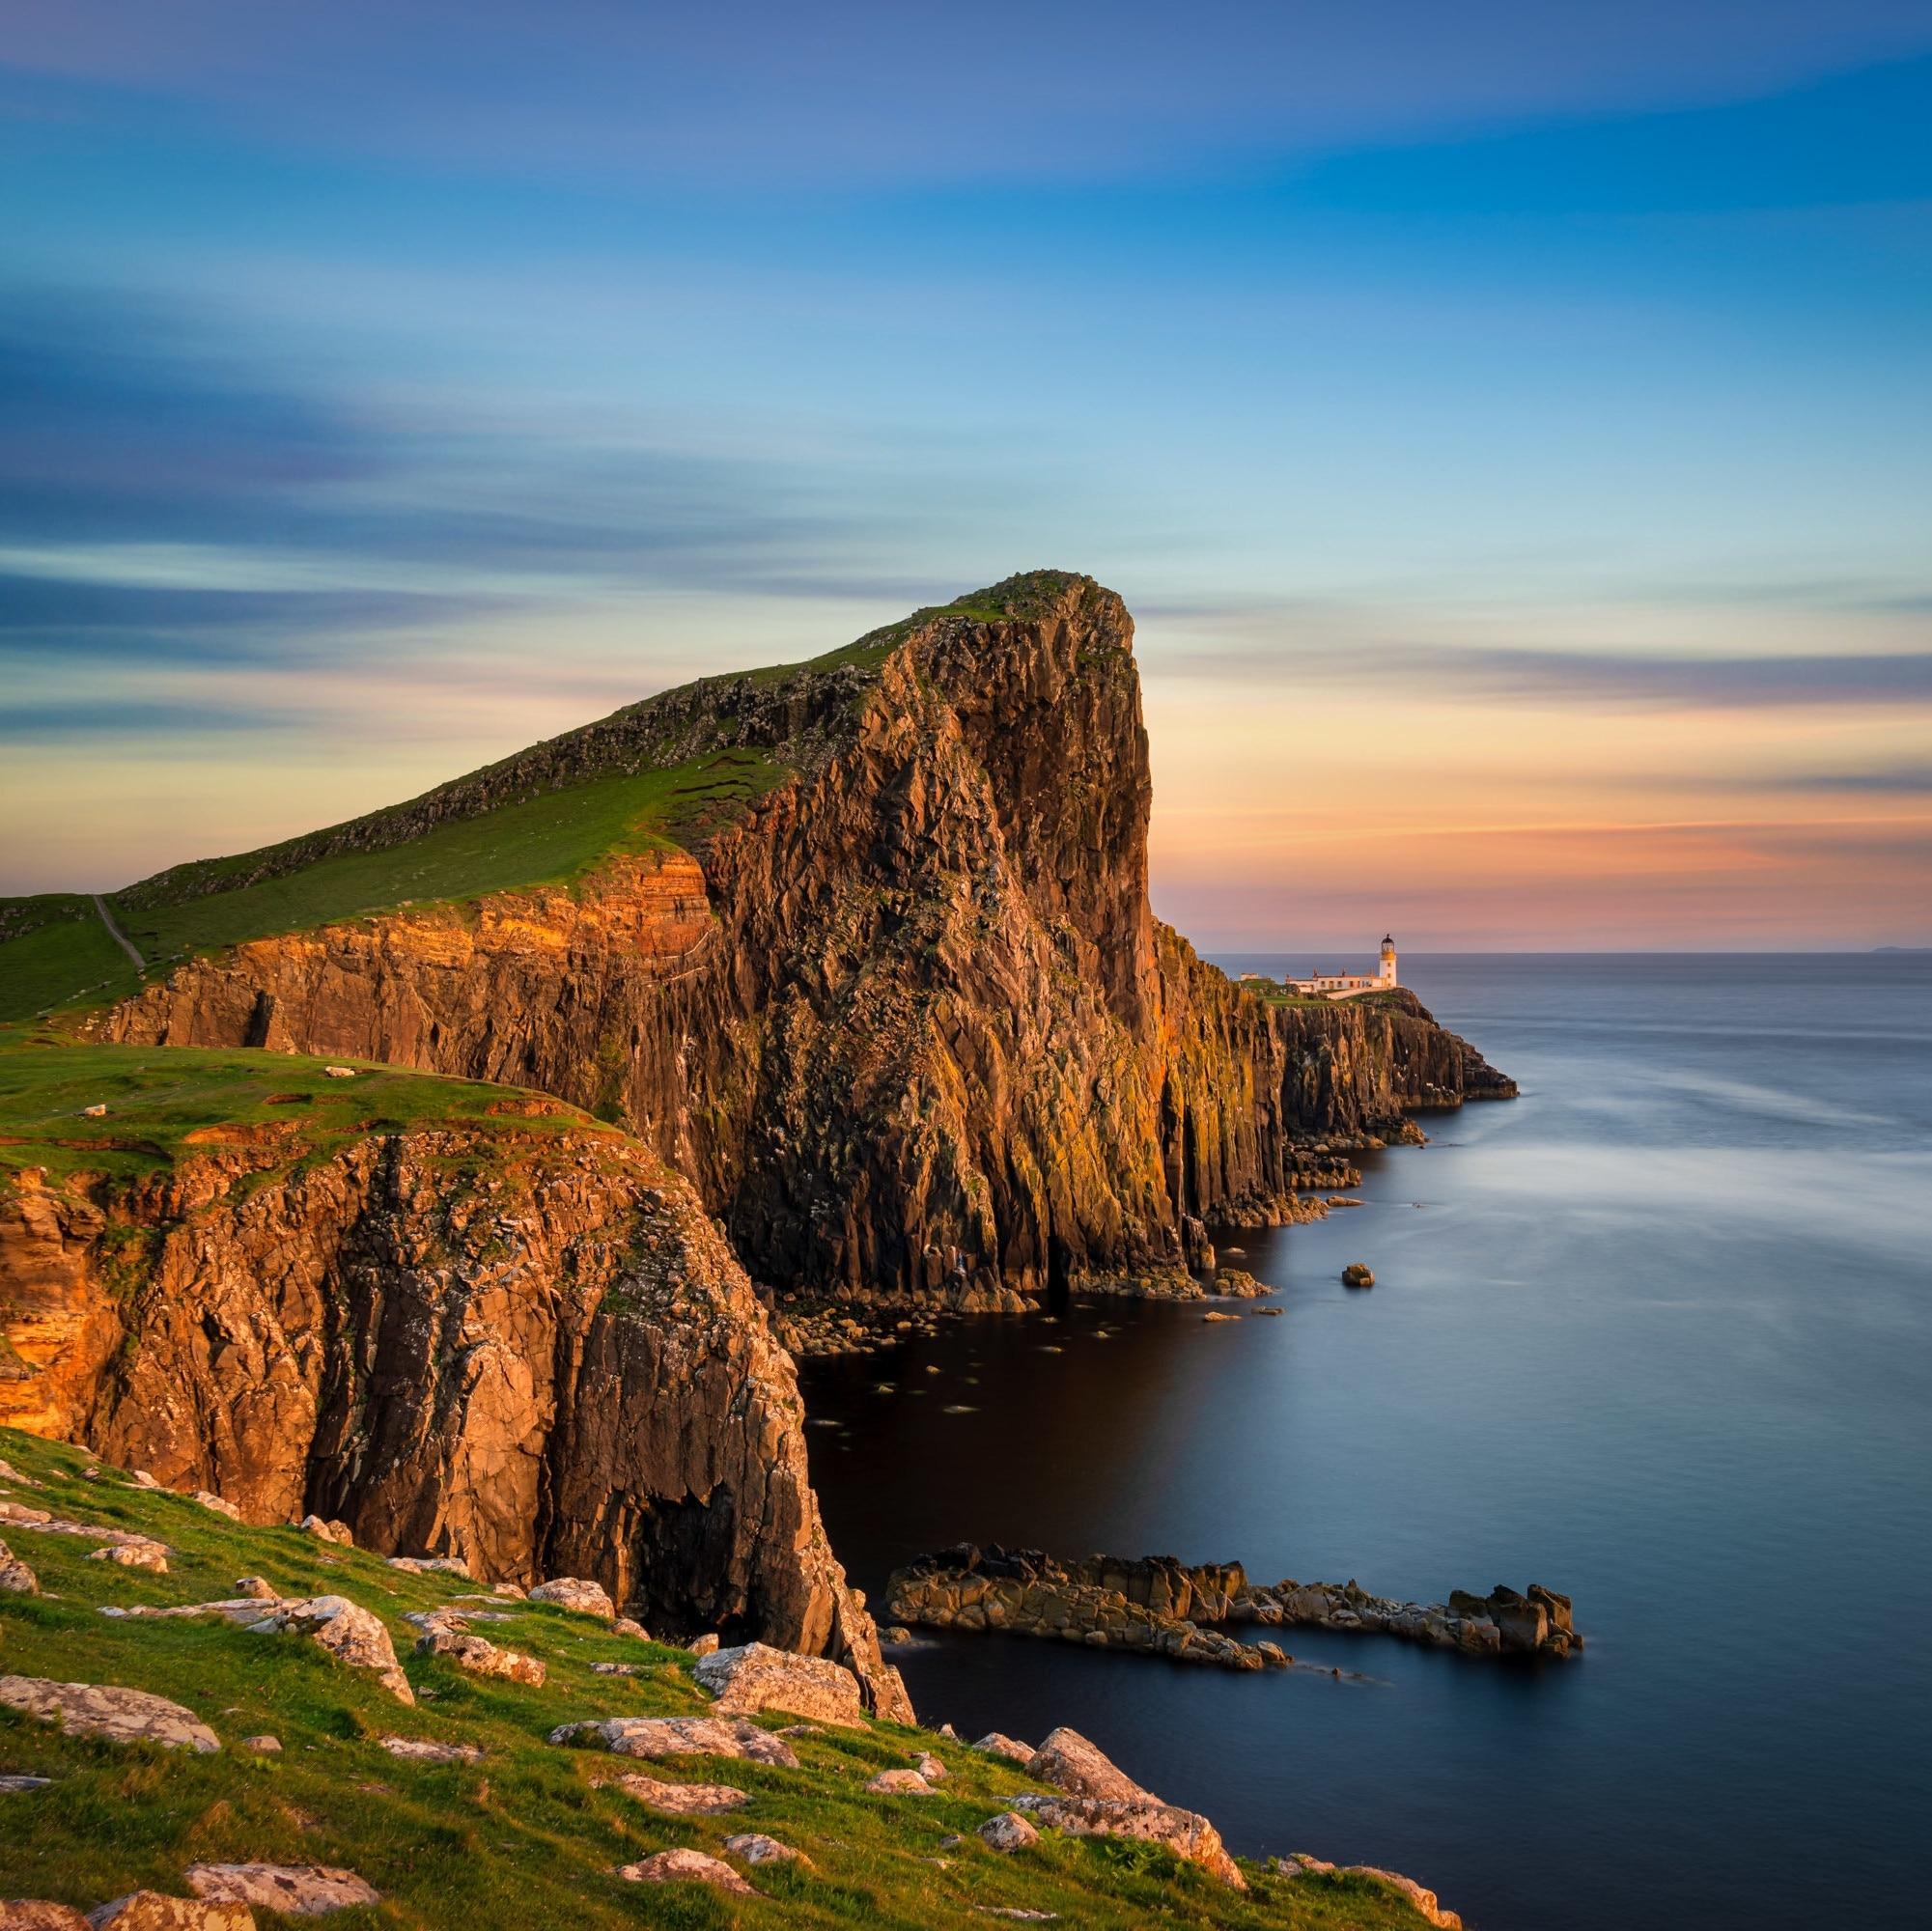 Isle of Skye, Scotland, United Kingdom